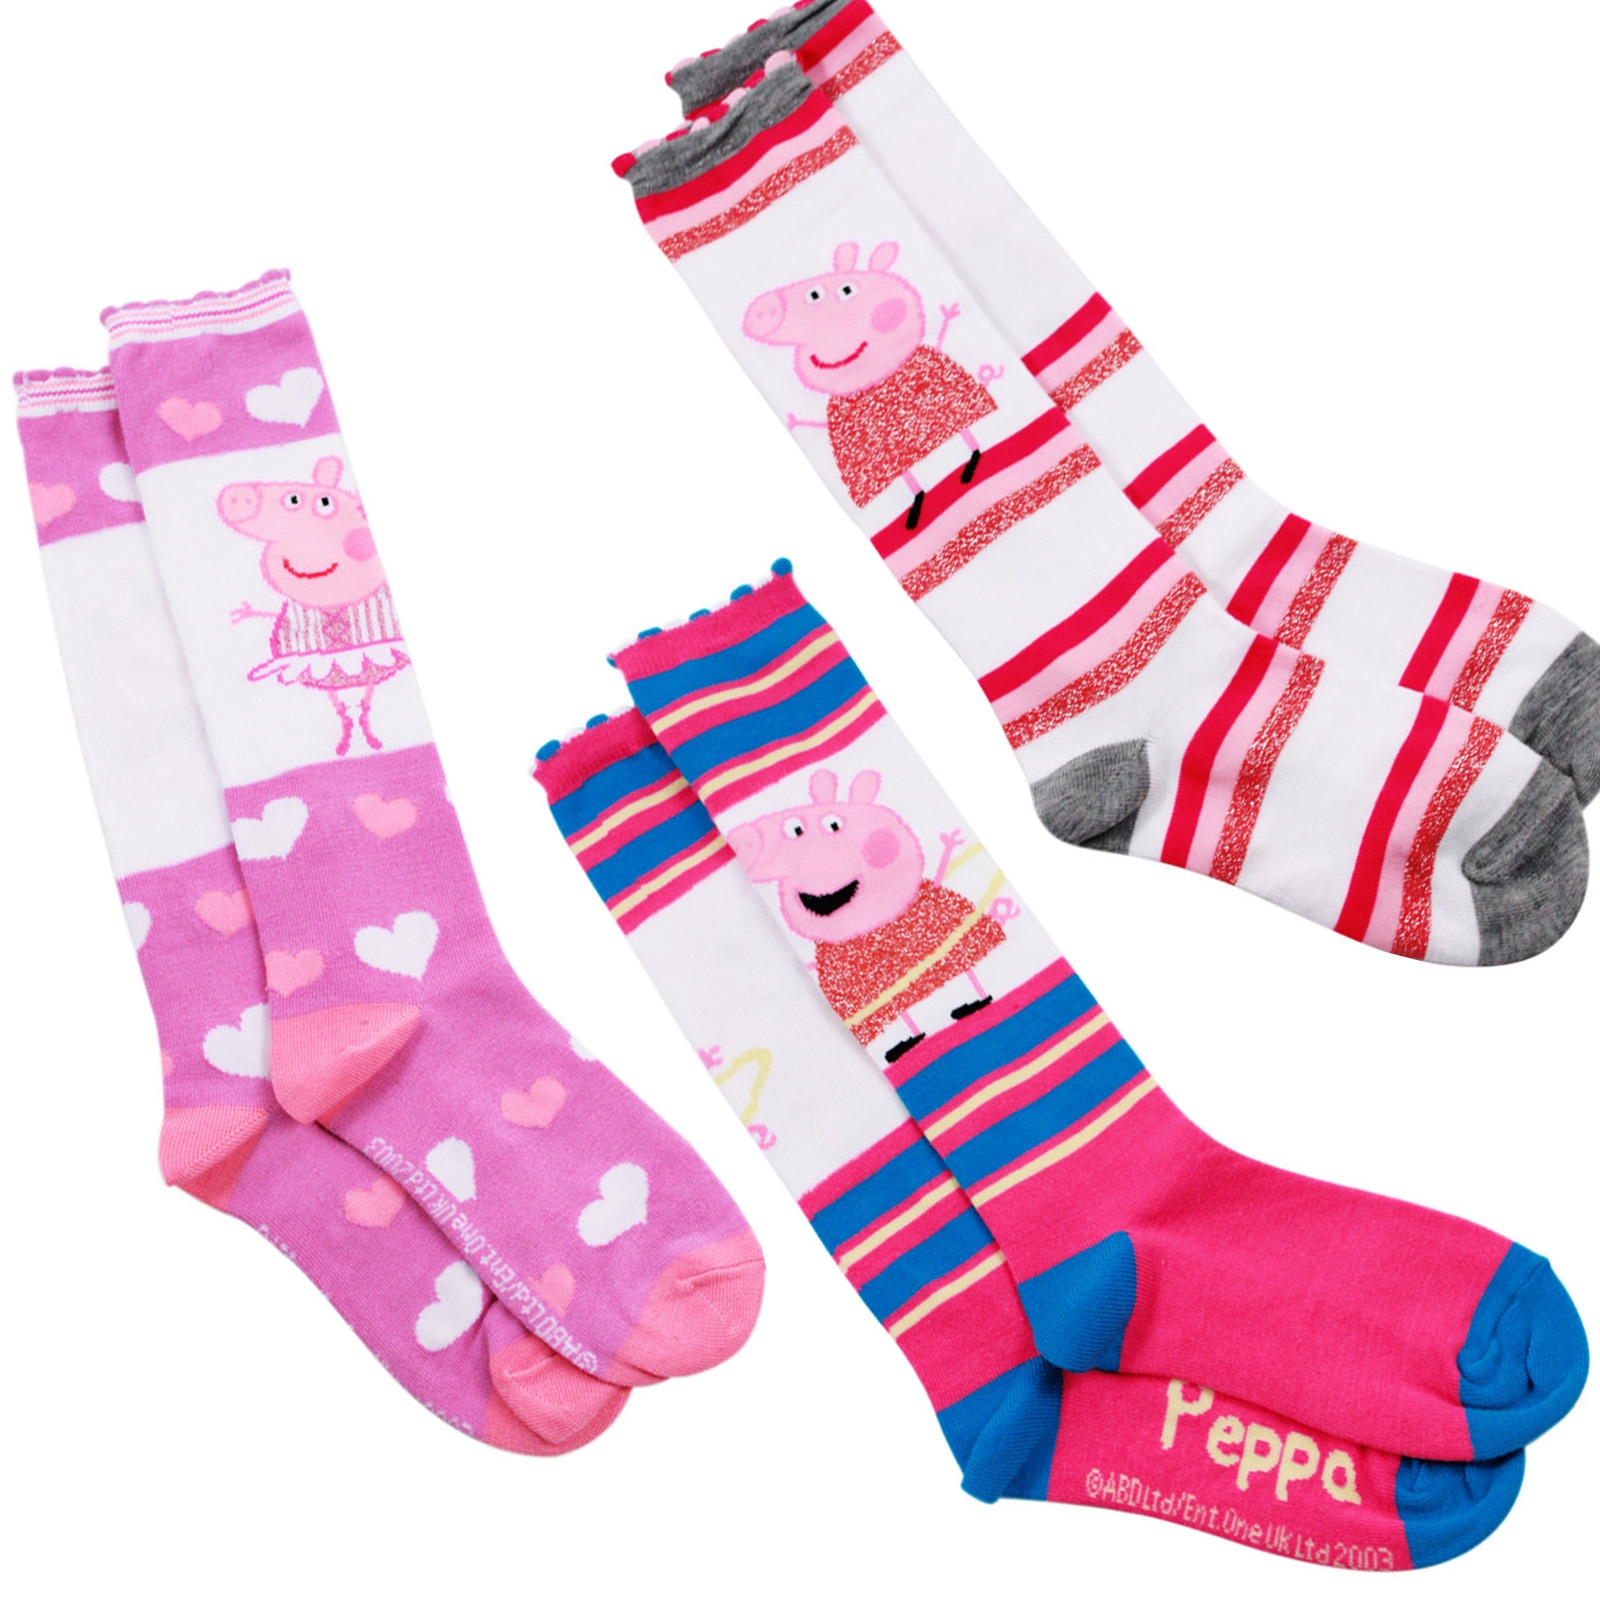 Peppa Pig Girls Knee High Socks Size 6-8 - Pink